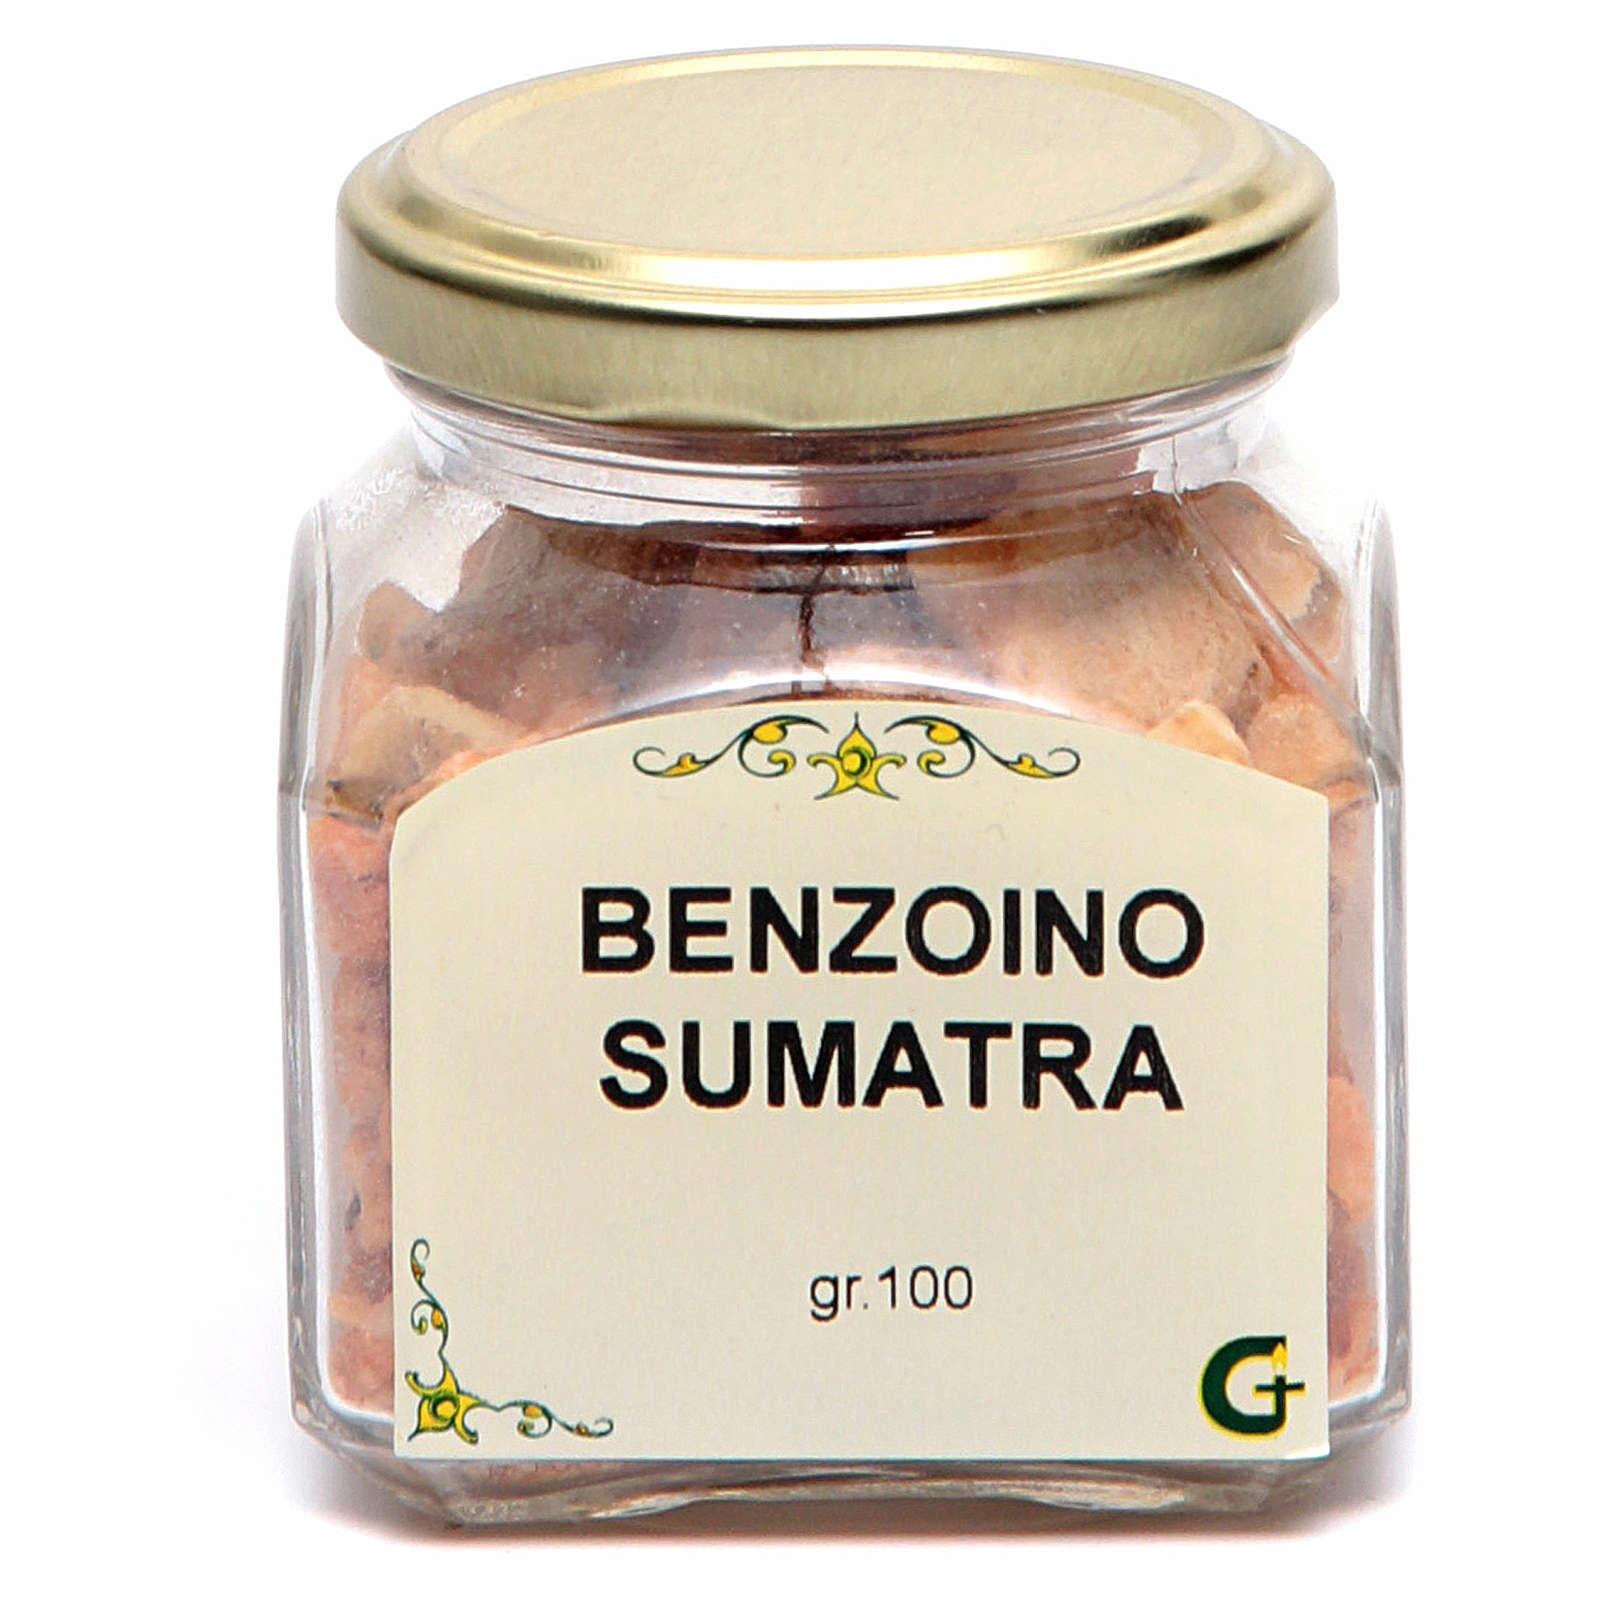 Benzoino Sumatra 100 gr 3